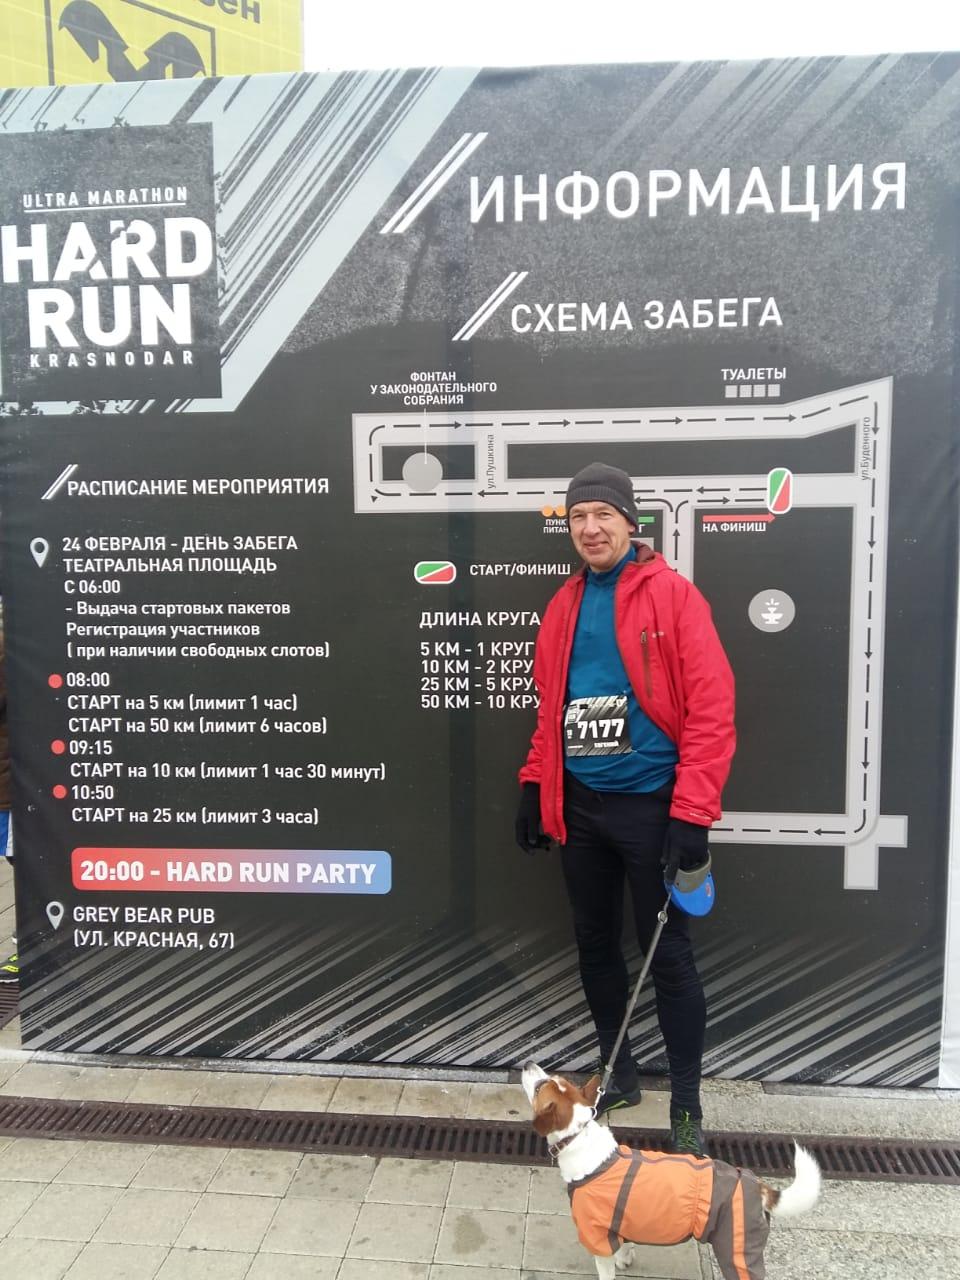 Евгений Пикулев, участник Hurd Run Krasnodar 2019